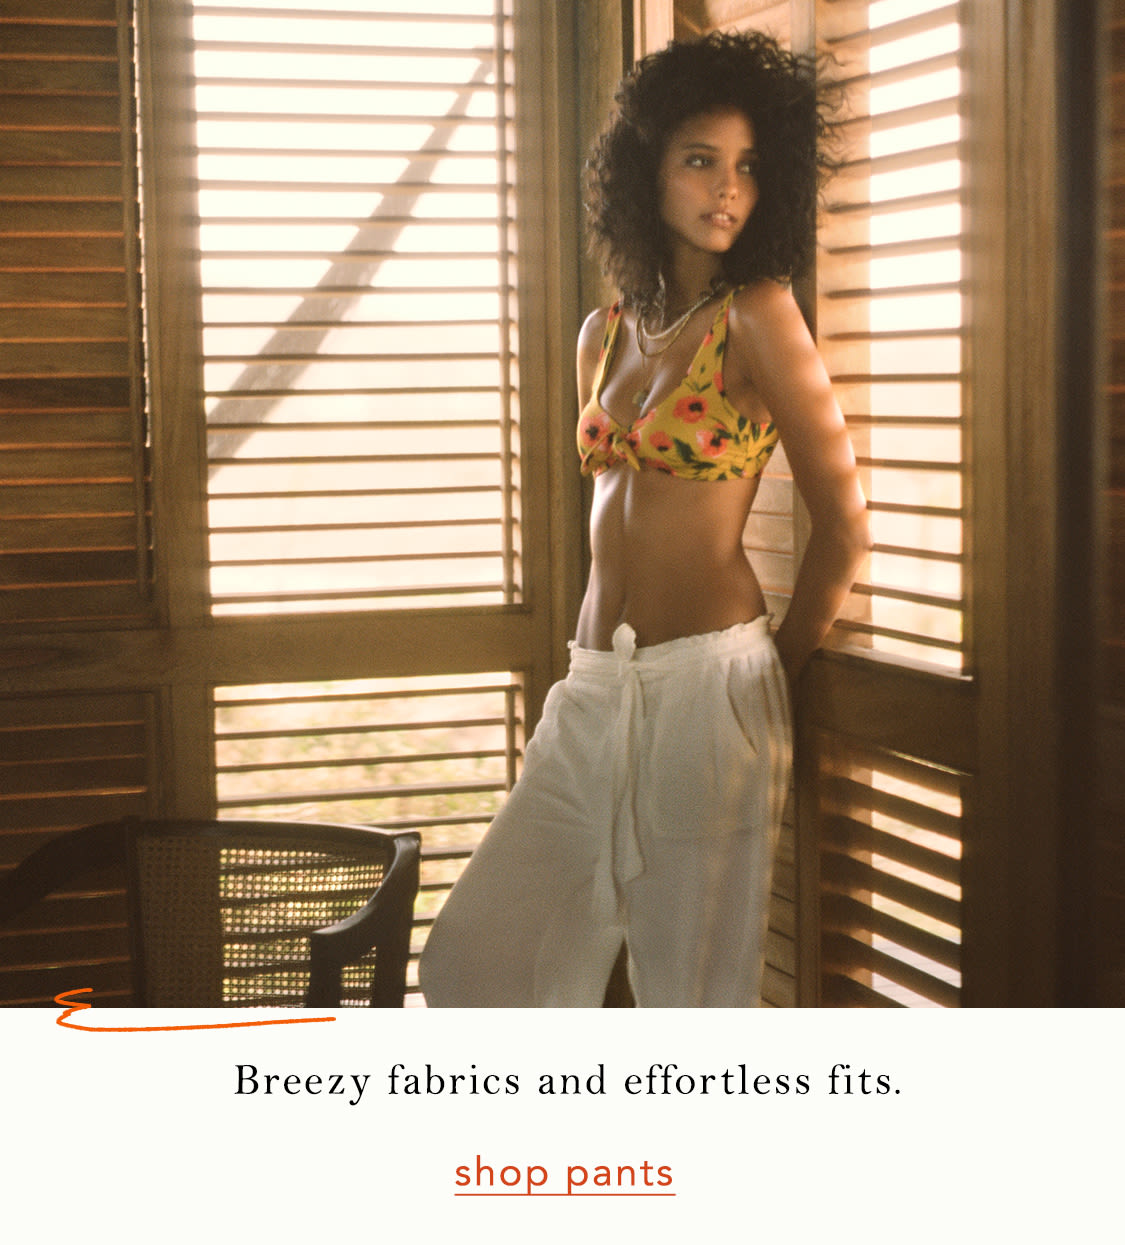 120e2205b42 Anthropologie - Women s Clothing